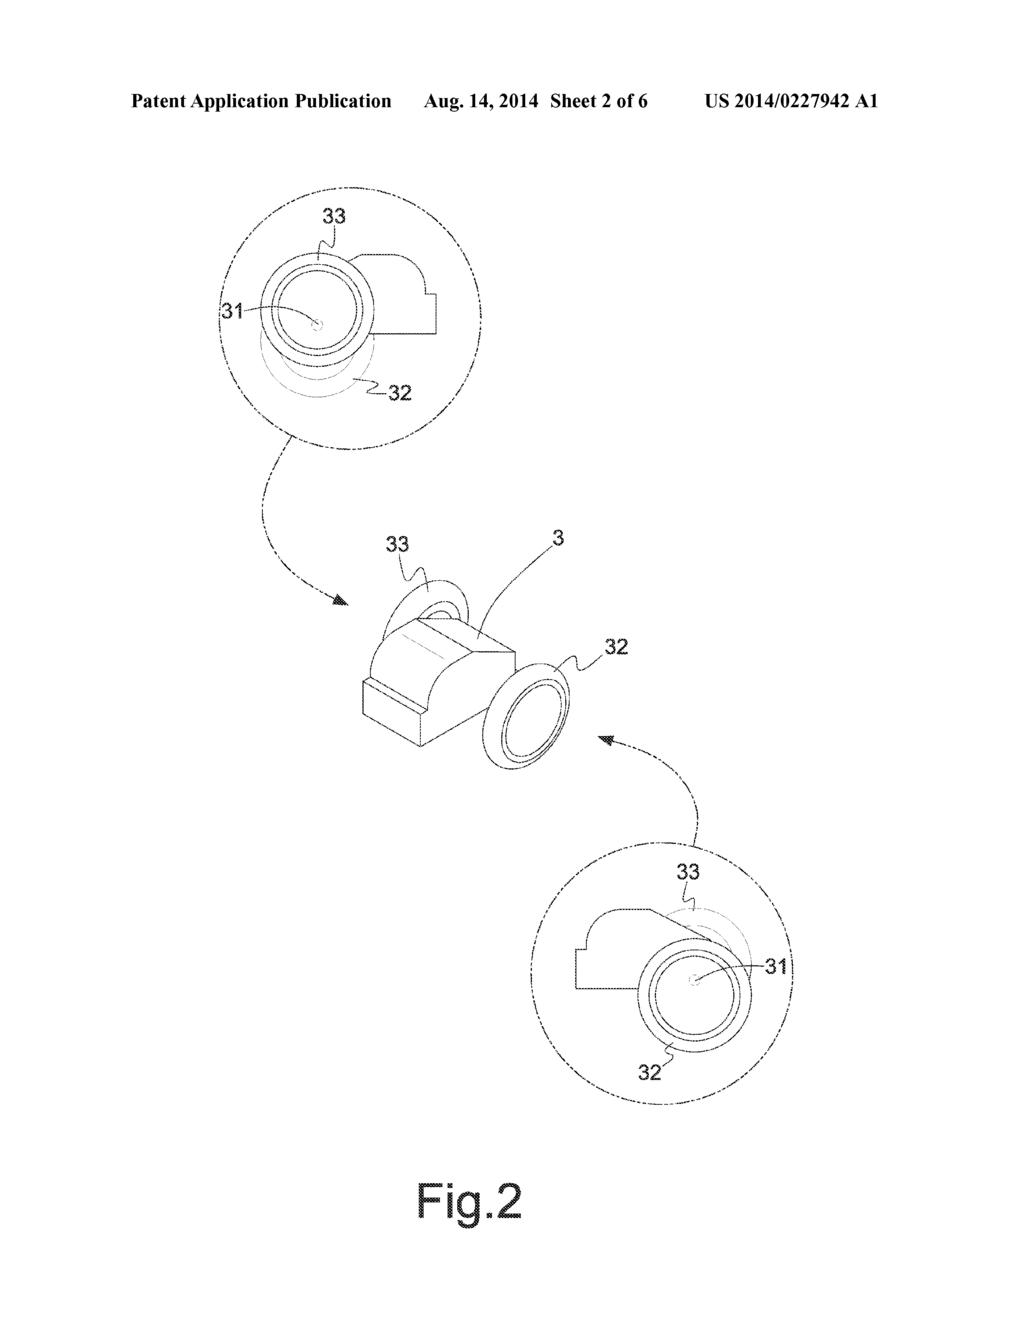 Toy Car Diagram Wiring Diagrams Mastercraft Maristar Eccentric Wheel Structure Of Wind Up Schematic Rh Patentsencyclopedia Com Remote Control Circuit